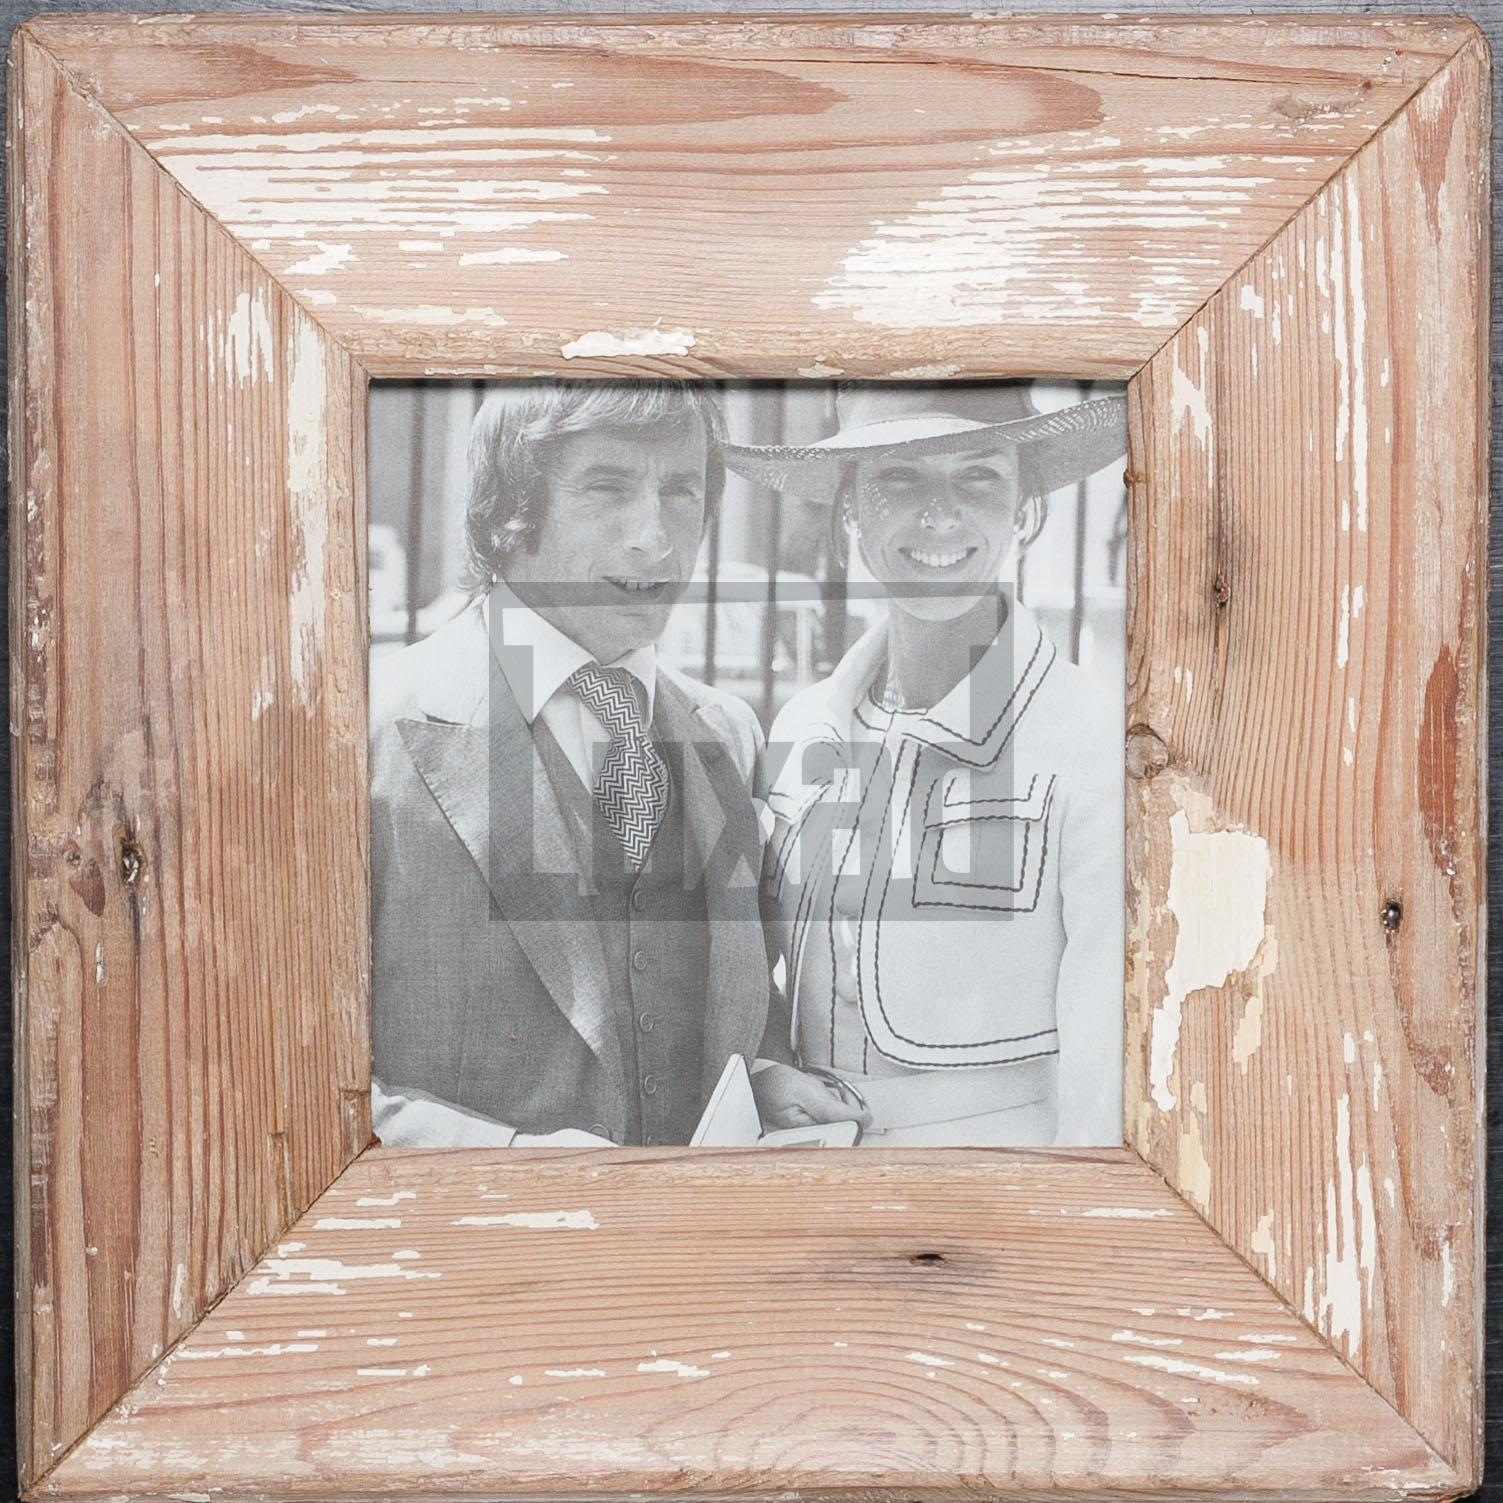 Quadratischer Bilderrahmen für quadratische Fotos